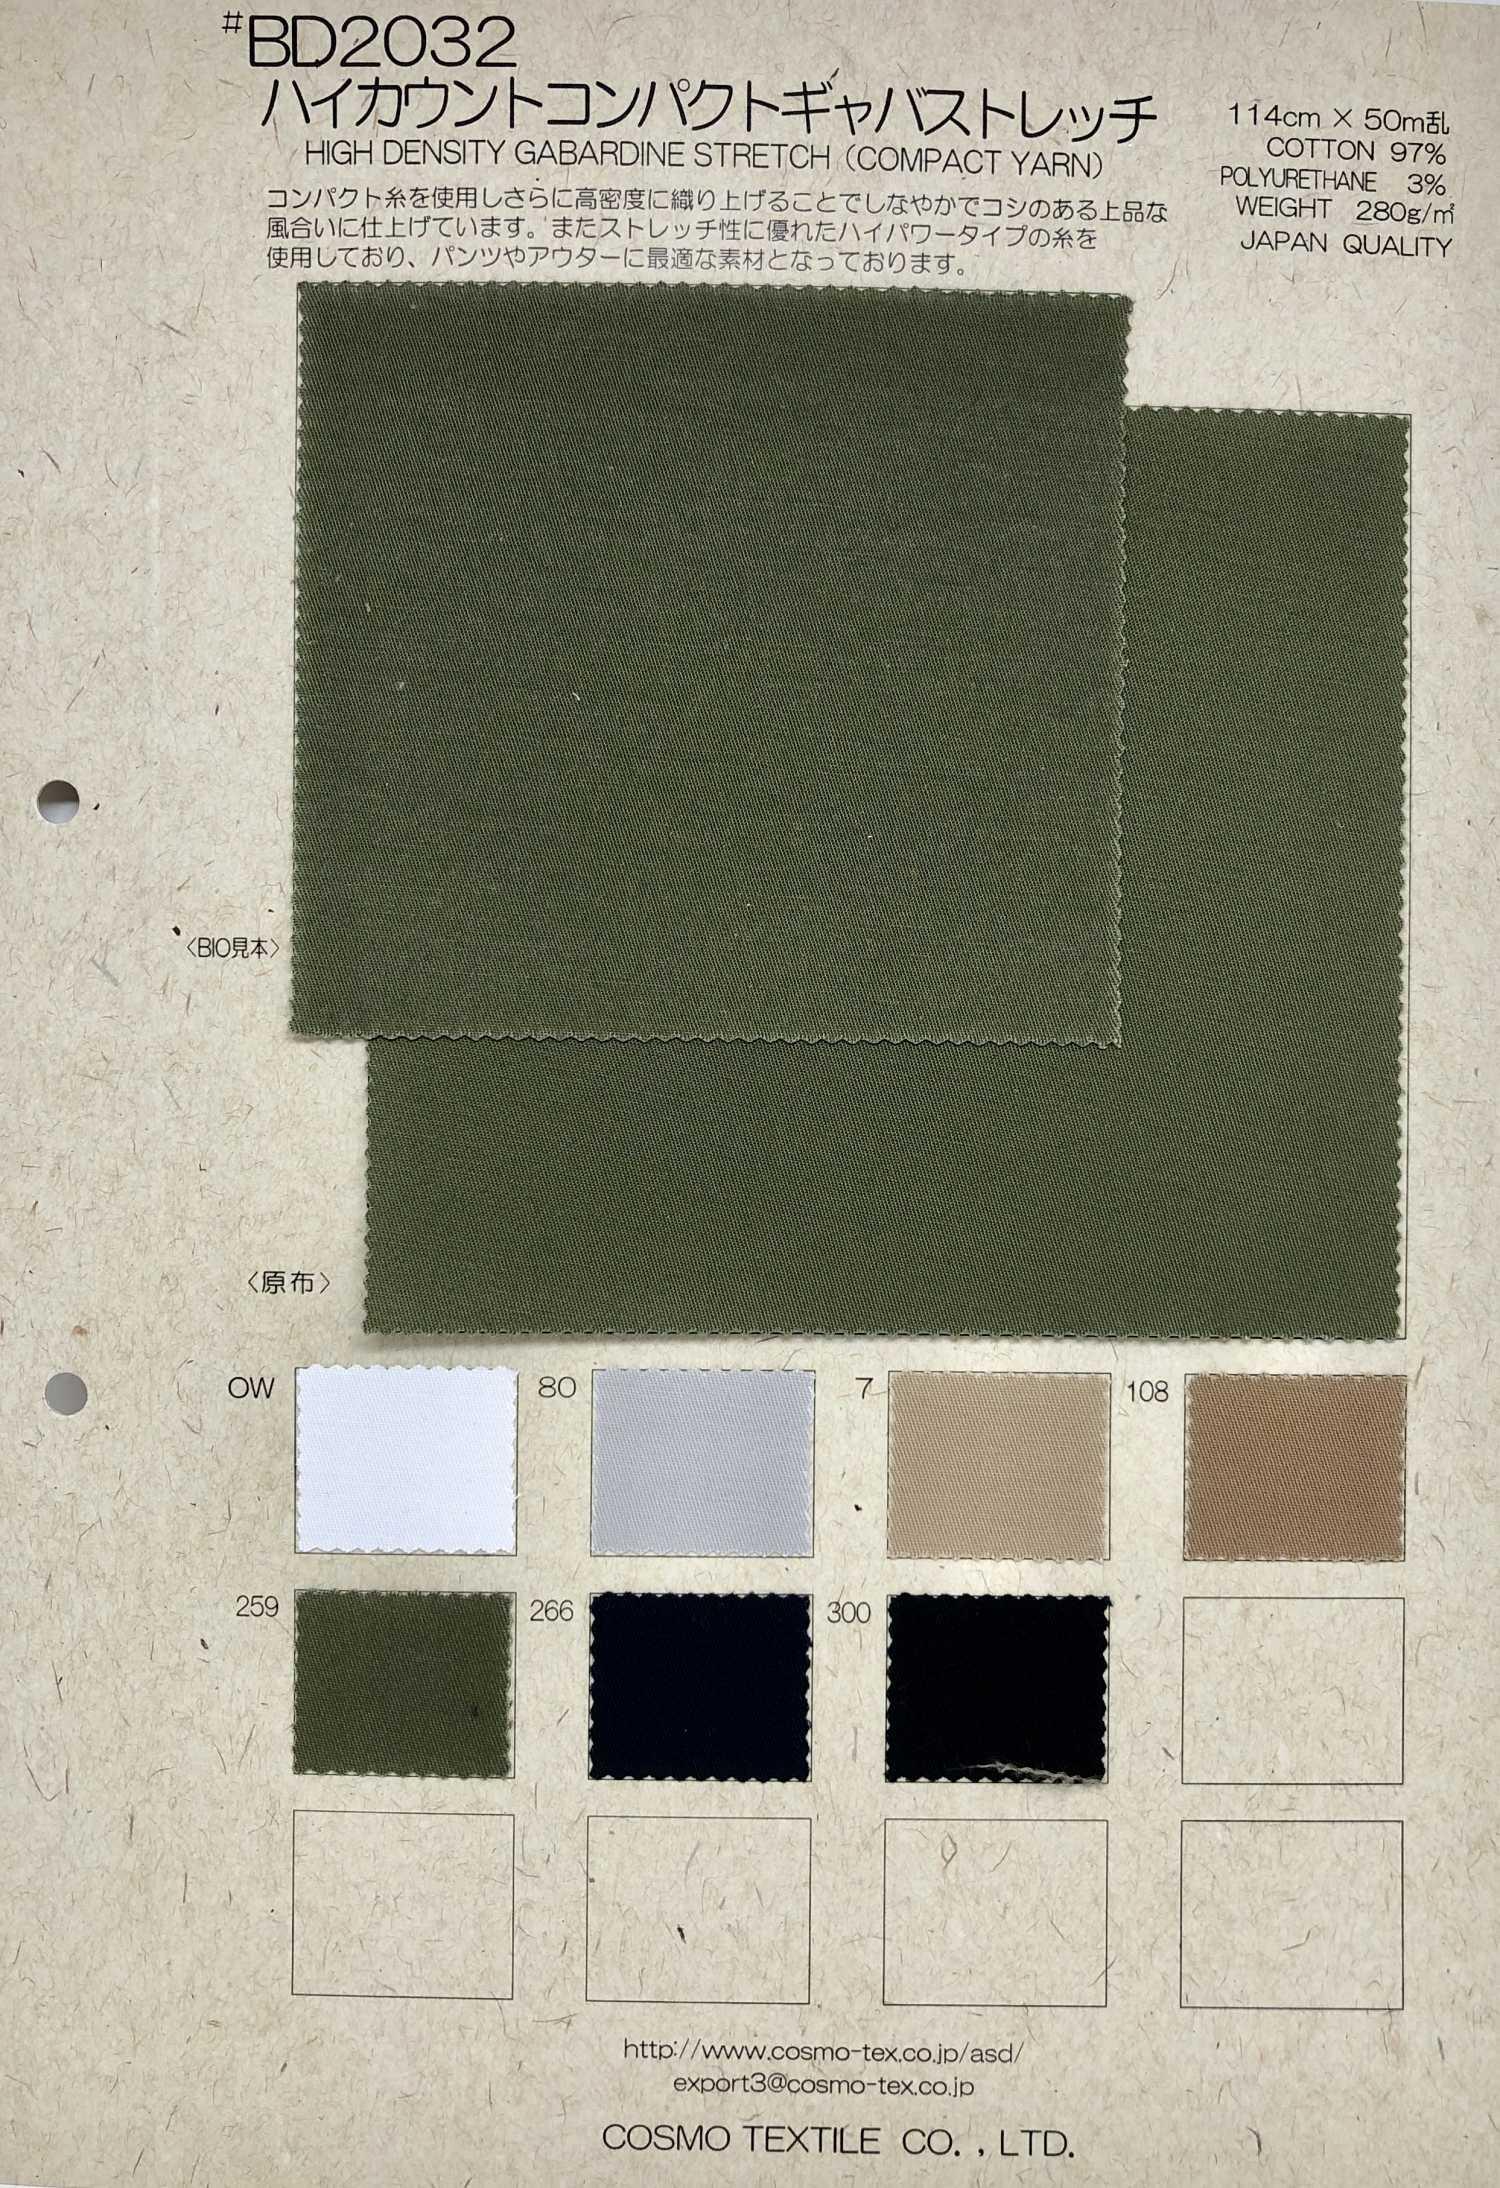 BD2032 ハイカウントコンパクトギャバストレッチ[生地] コスモテキスタイル/オークラ商事 - ApparelX アパレル資材卸通販